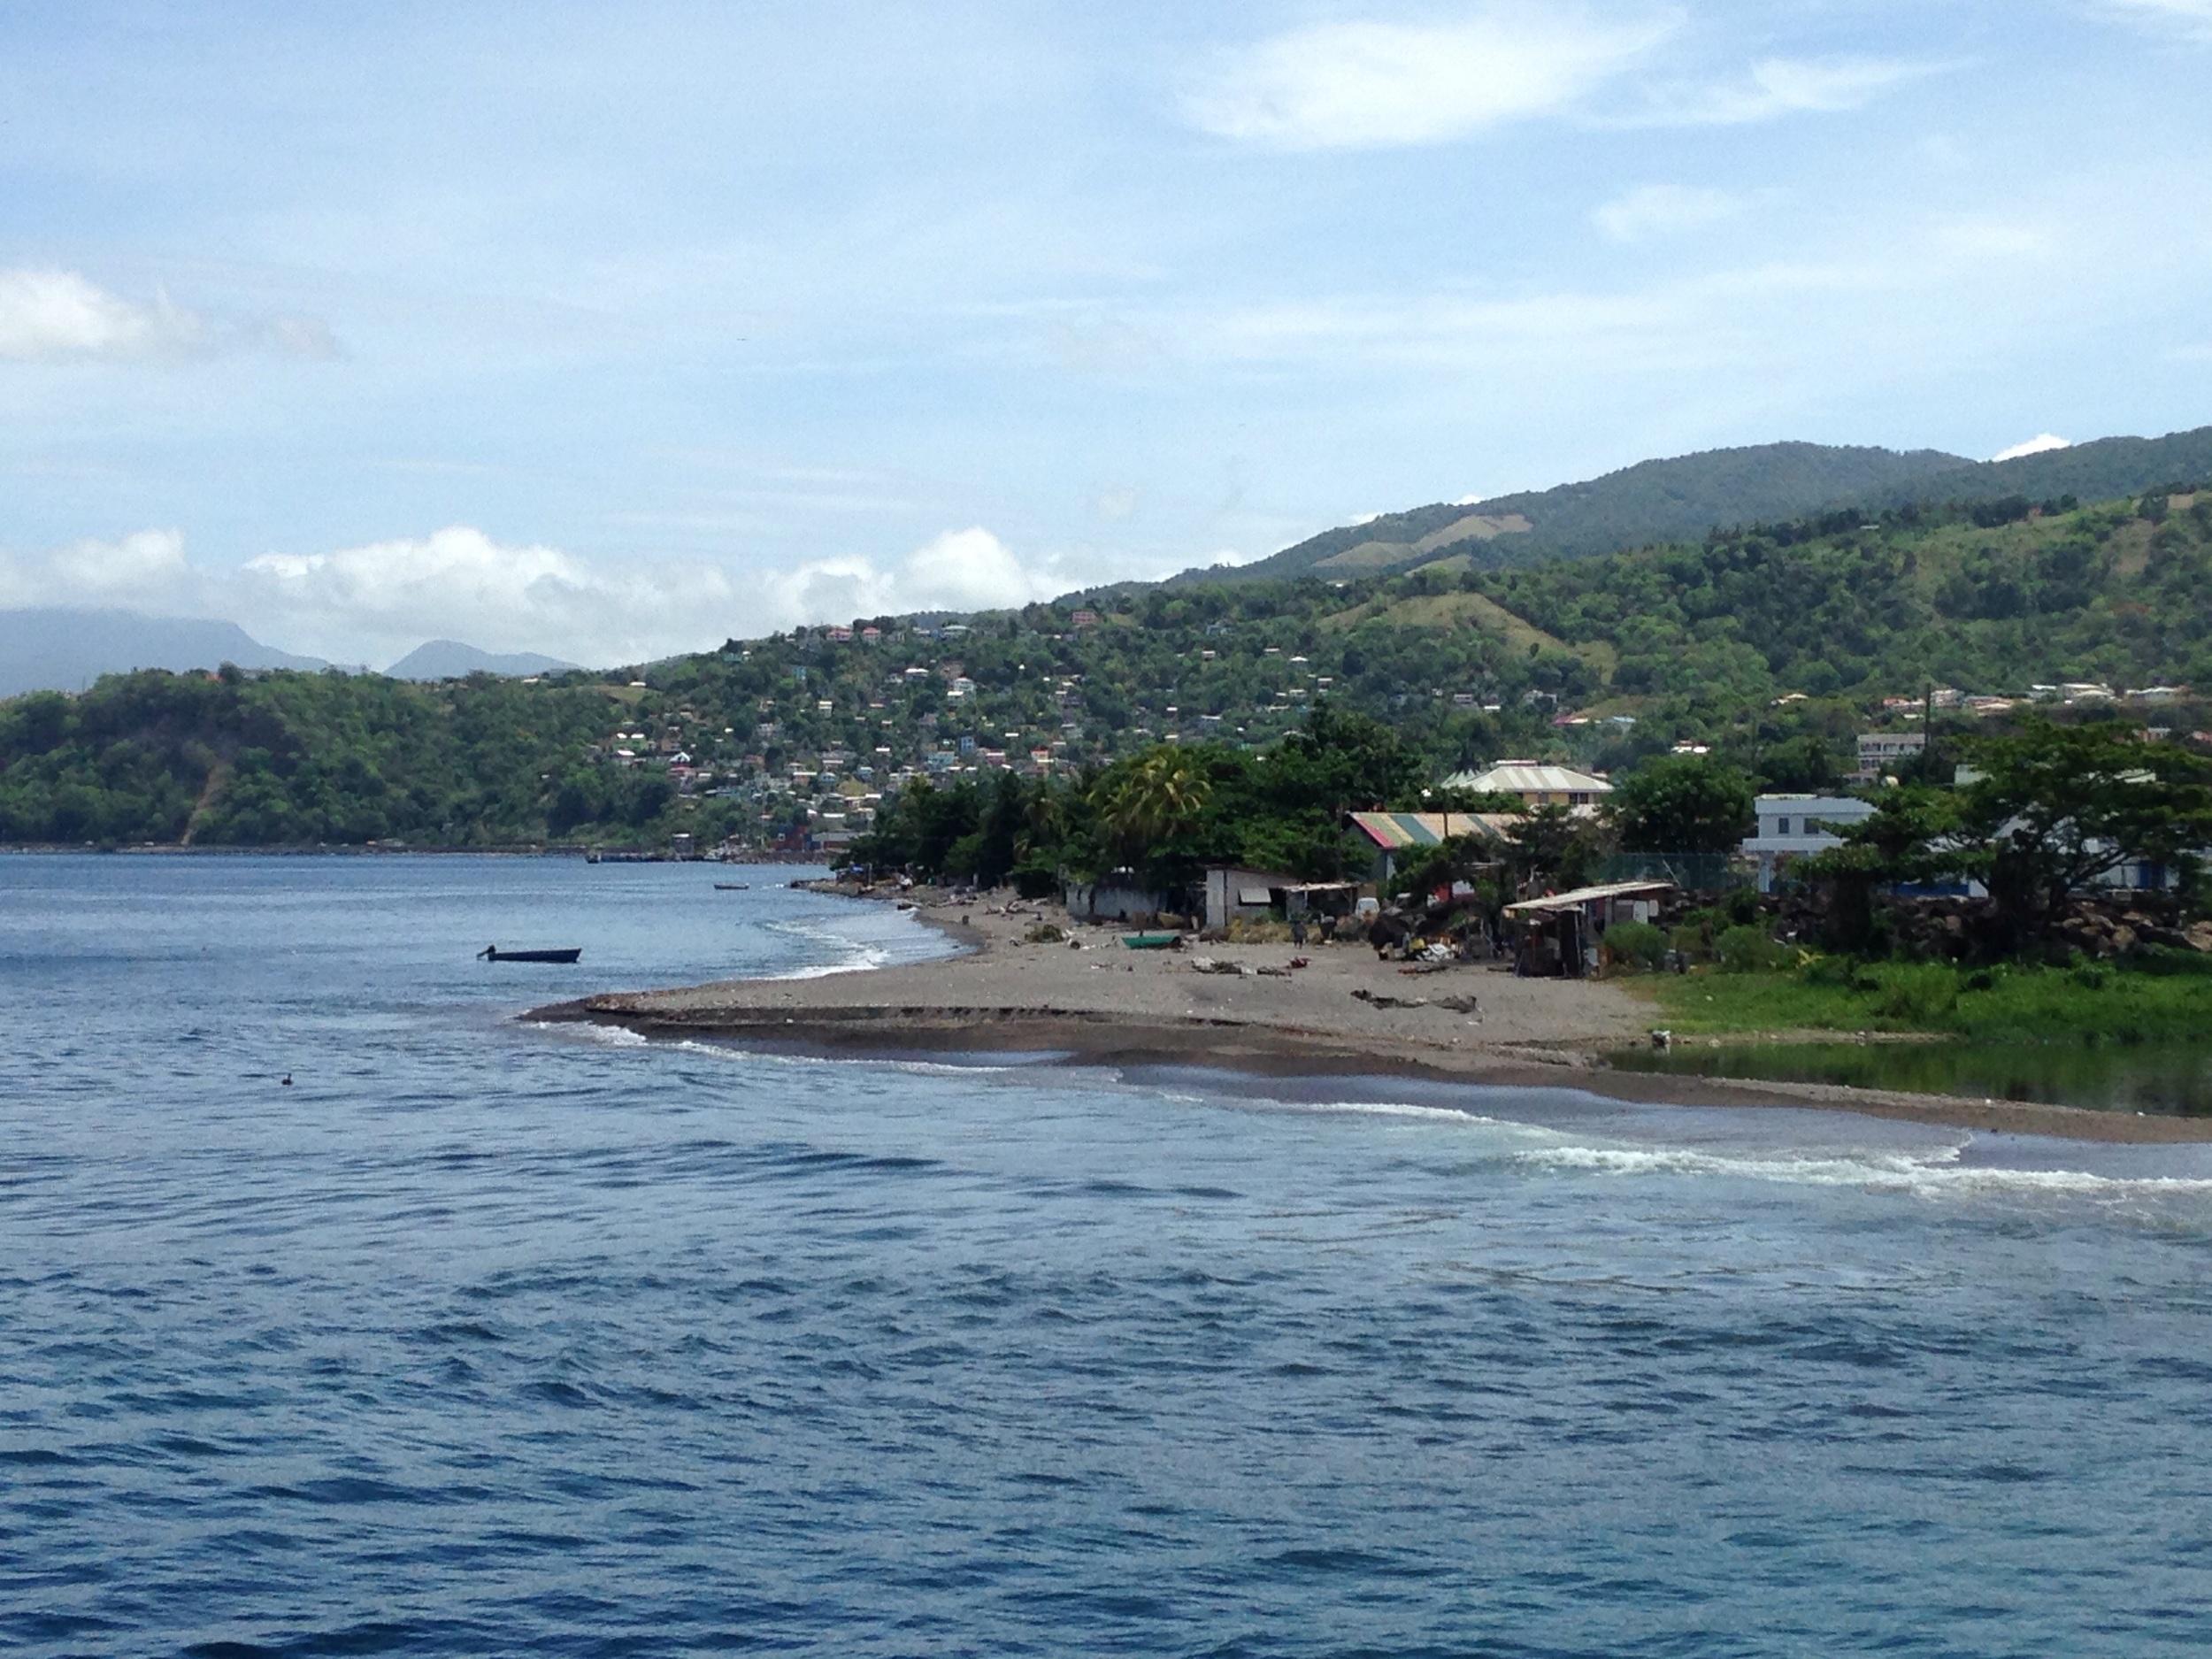 Arrival in Dominica